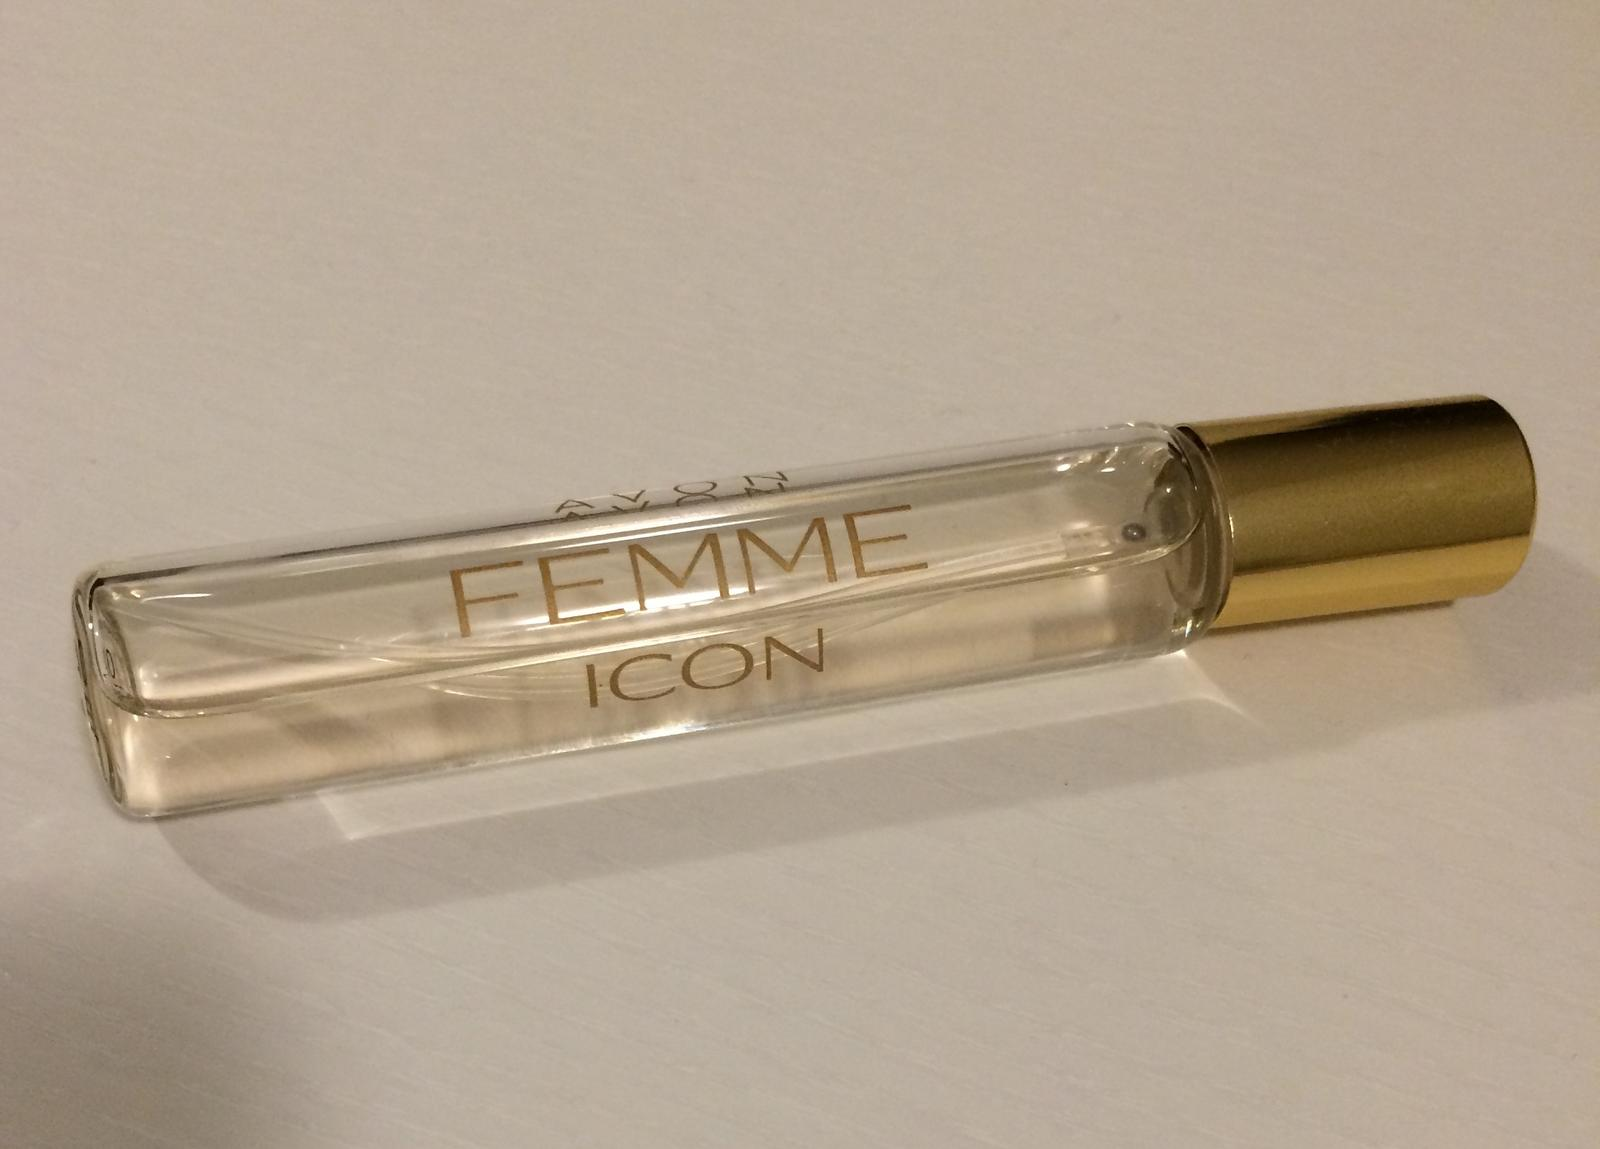 Avon - Femme Icon - Obrázok č. 1